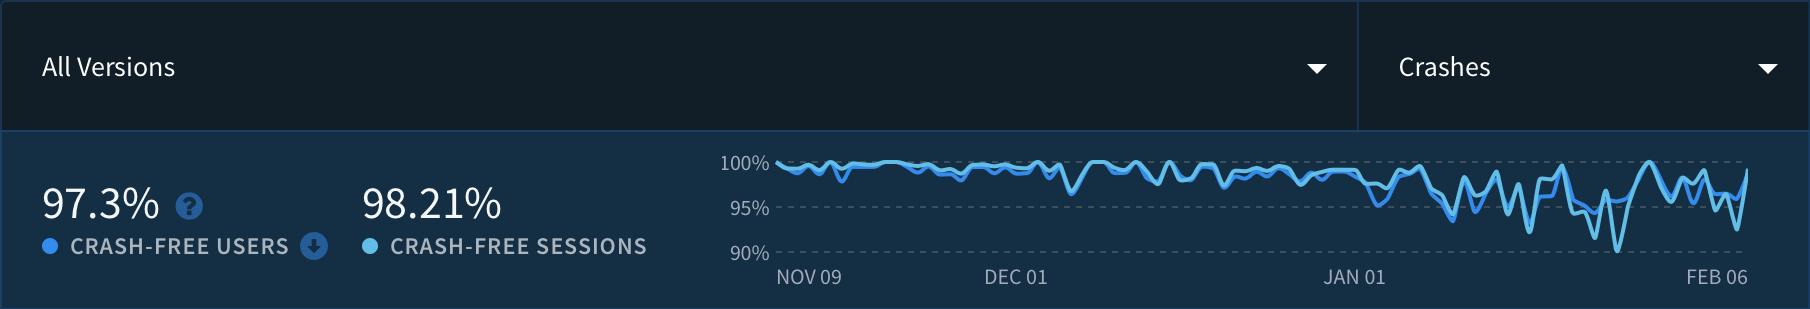 dayz memory error crash